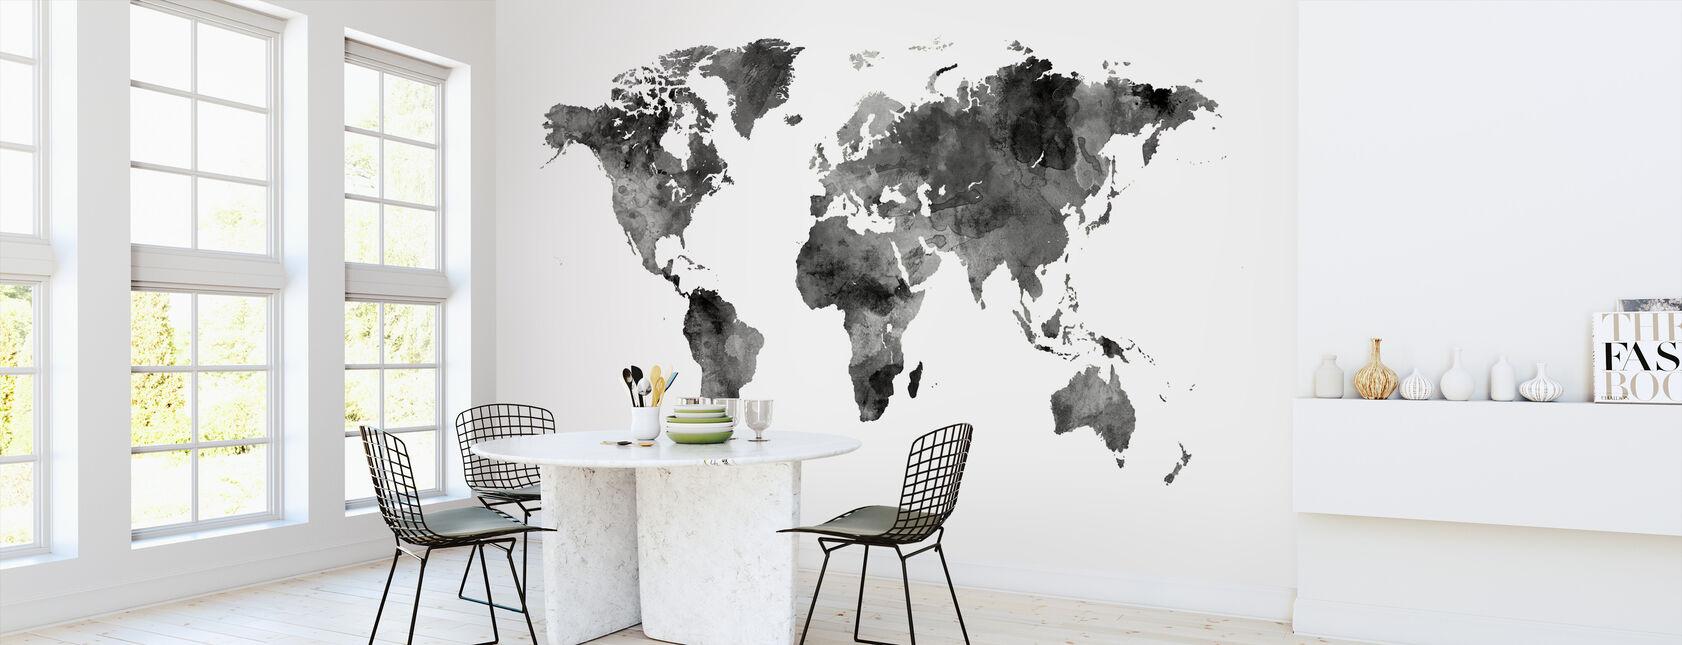 Akvarel verdenskort Sort - Tapet - Køkken